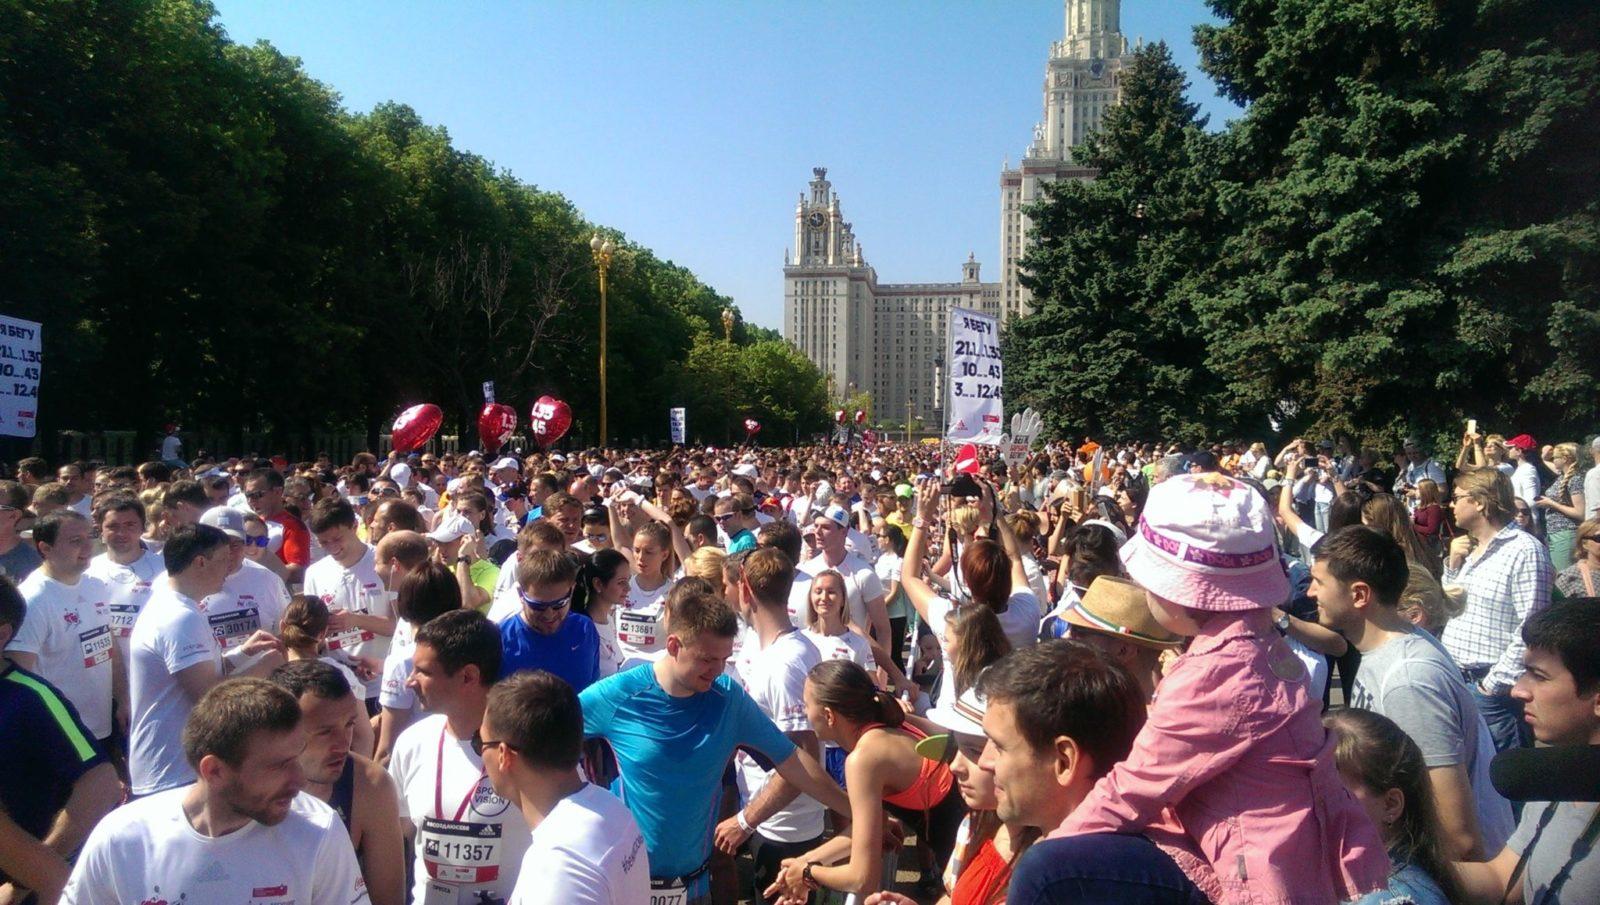 БЕГУЩИЕ СЕРДЦА, МОСКВА 29.5.2016